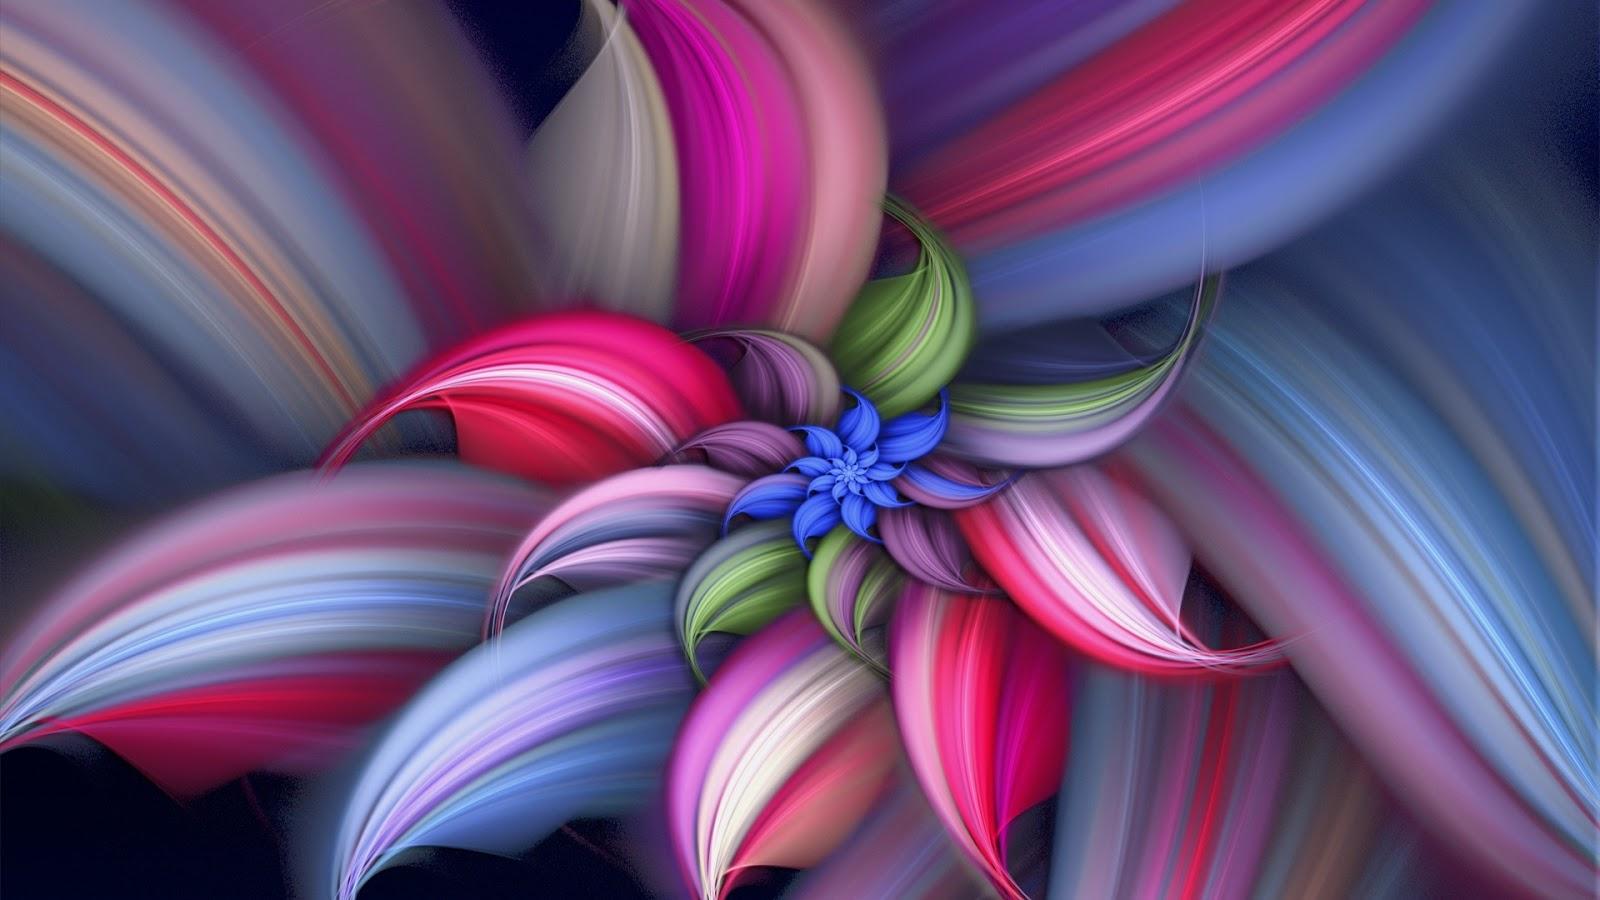 Rose Flower Wallpapers Blogging Tips Social Media TipsSEO Tips 1600x900